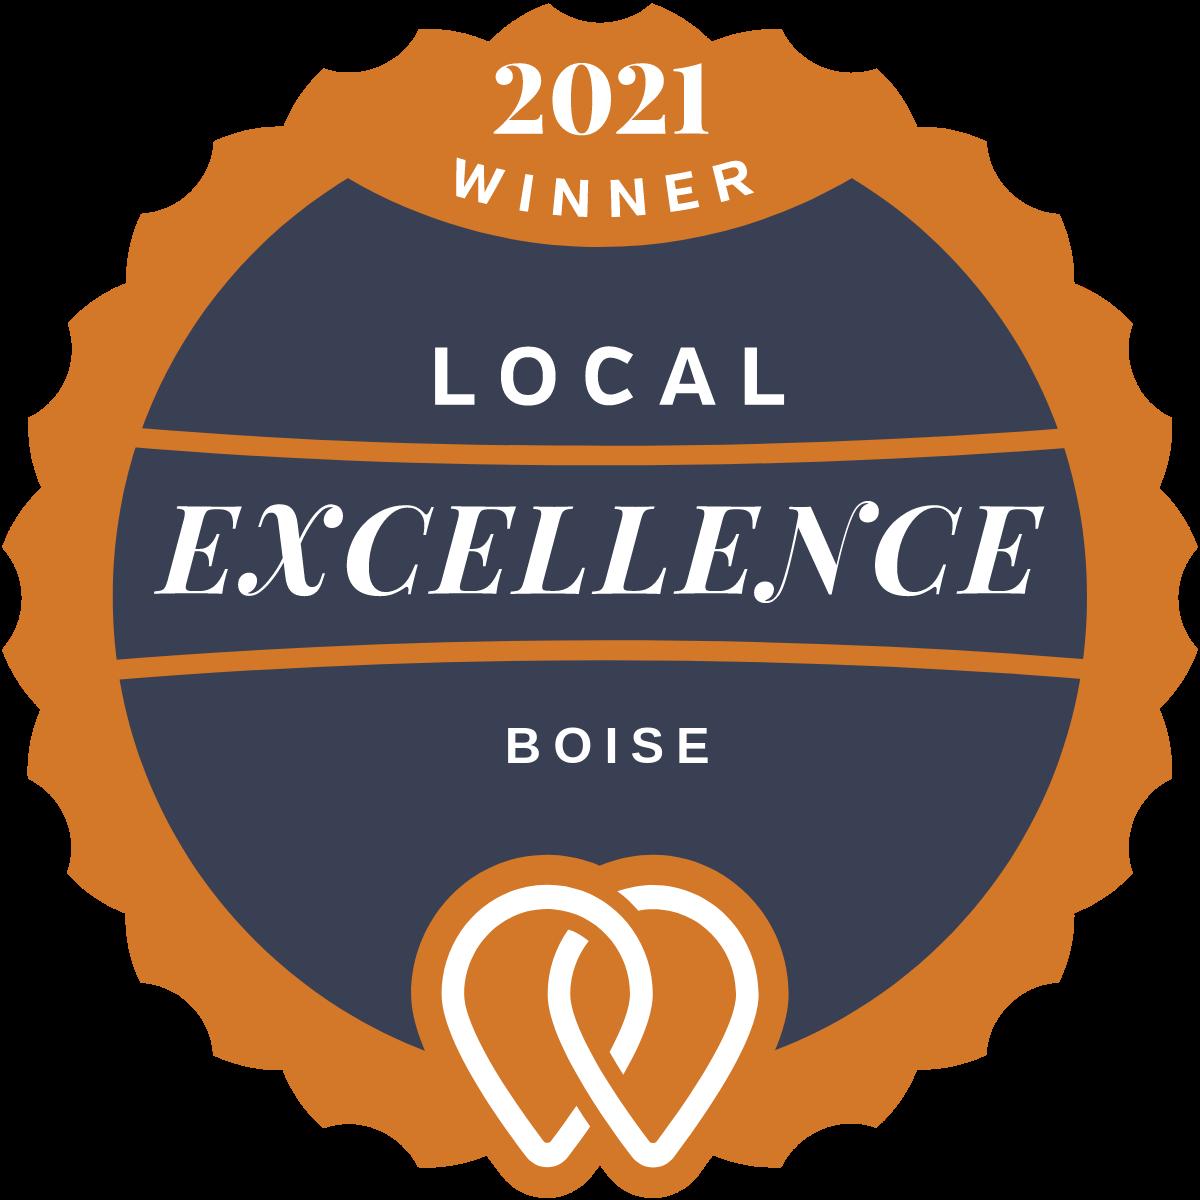 2021 UpCity Boise Local Excellence Winner badge